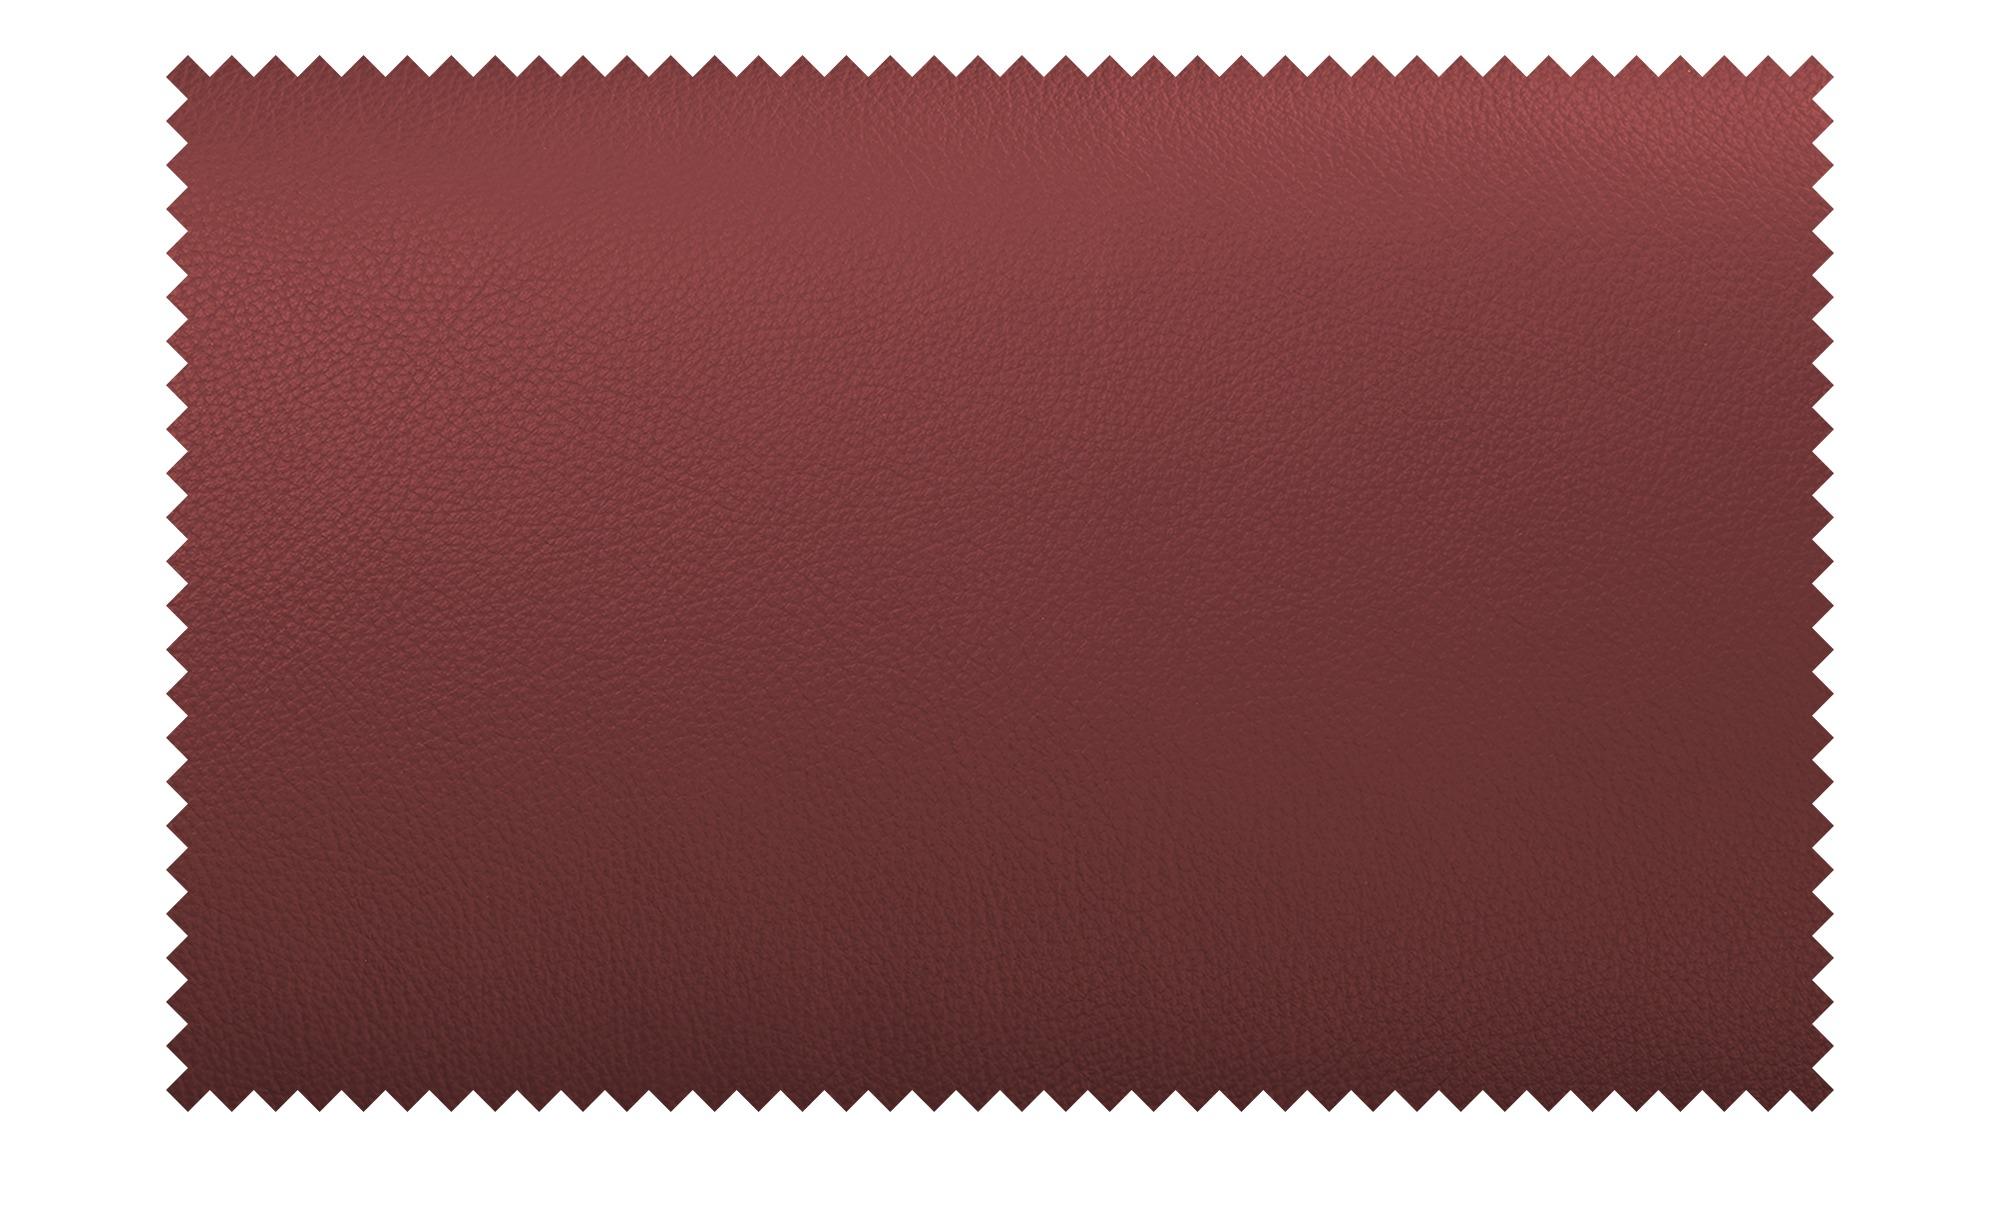 Ecksofa Leder Dallas ¦ rot ¦ Maße (cm): H: 74 Polstermöbel > Sofas >  Ecksofas - Höffner